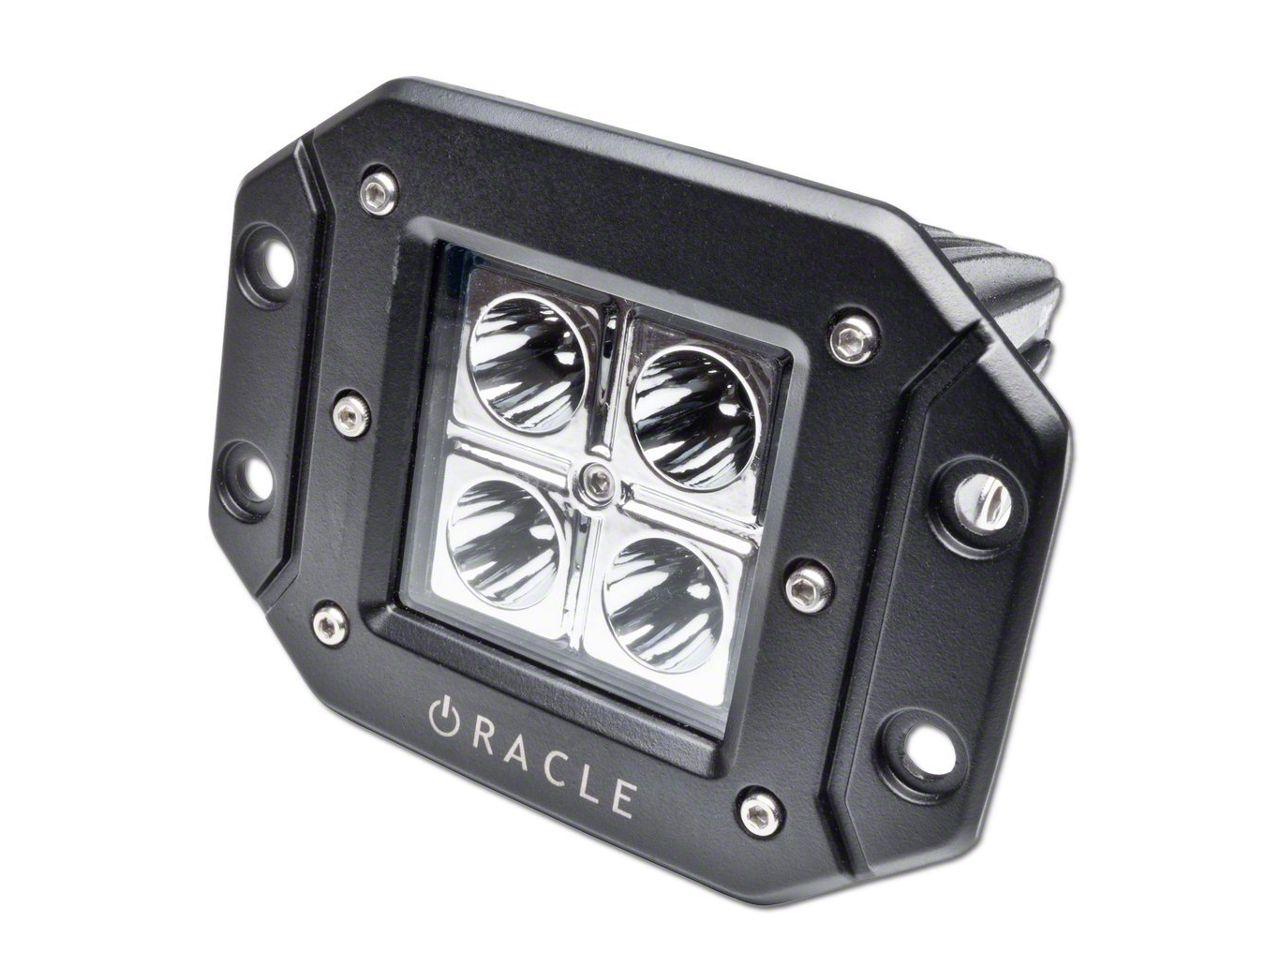 Oracle Off-Road Series Square Flush Mount LED Light - Spot Beam